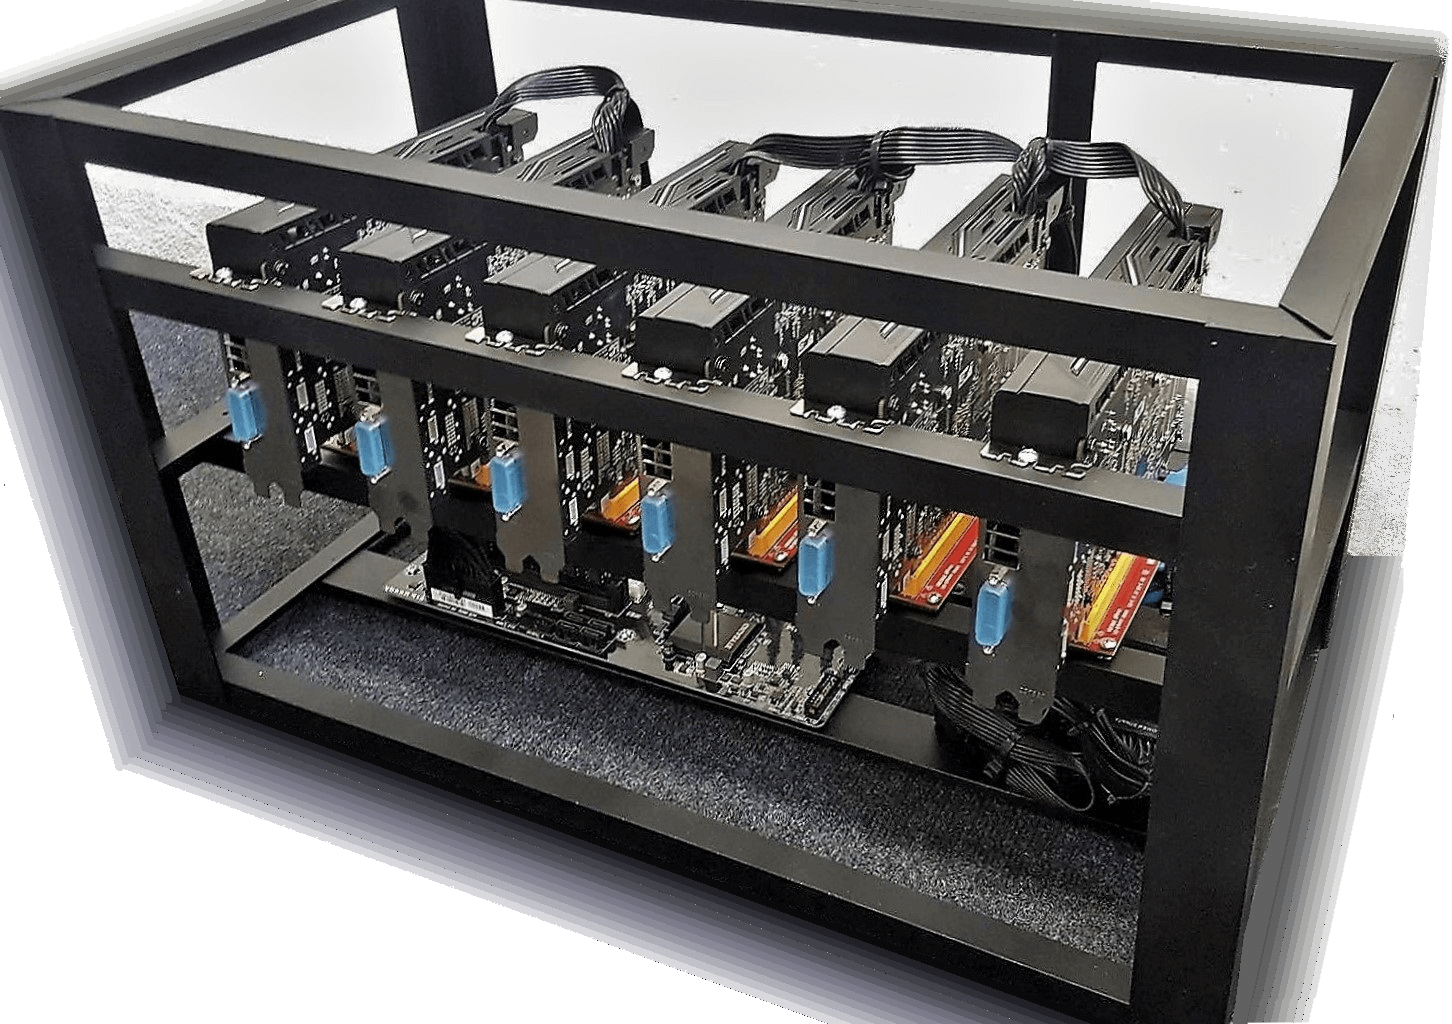 GPU mining RIG – Profi Výroba již od @2015. PLUG-&-PLAY system